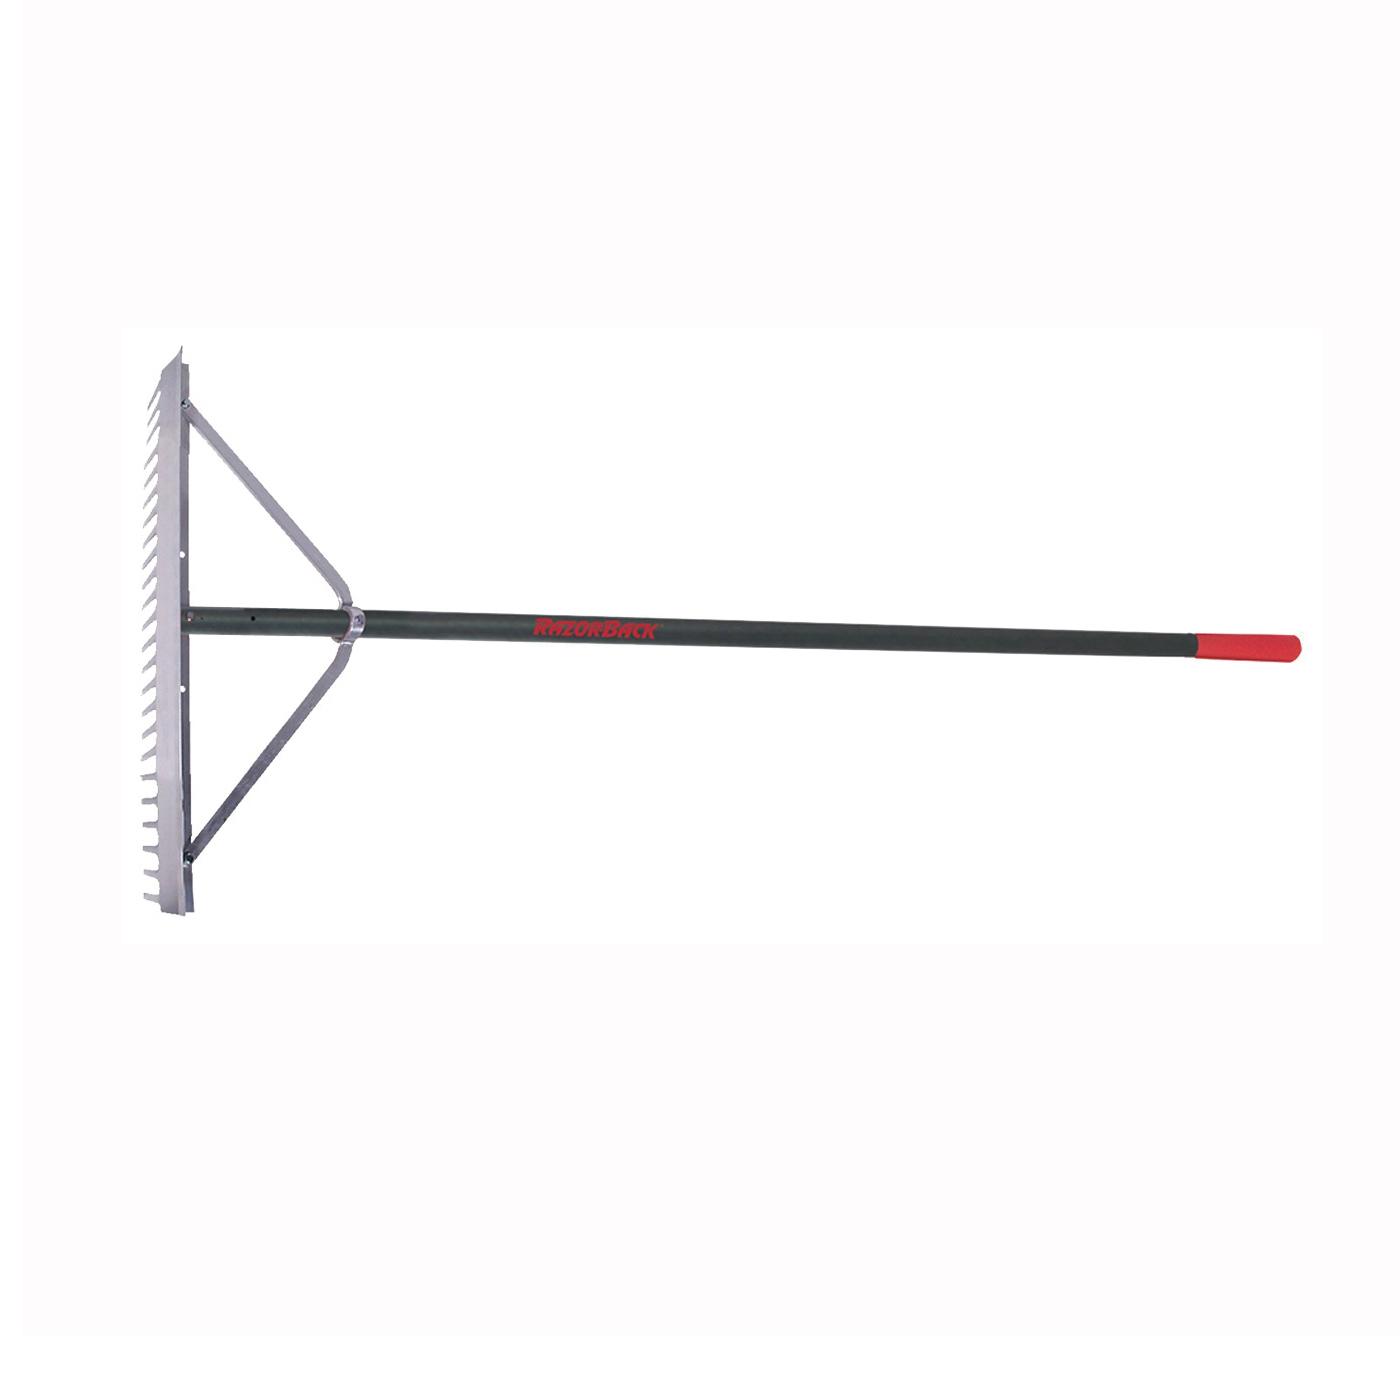 Picture of RAZOR-BACK 63136 Landscape Rake, 4-1/2 in L Head, 24 in W Head, 24 -Tine, Aluminum Head